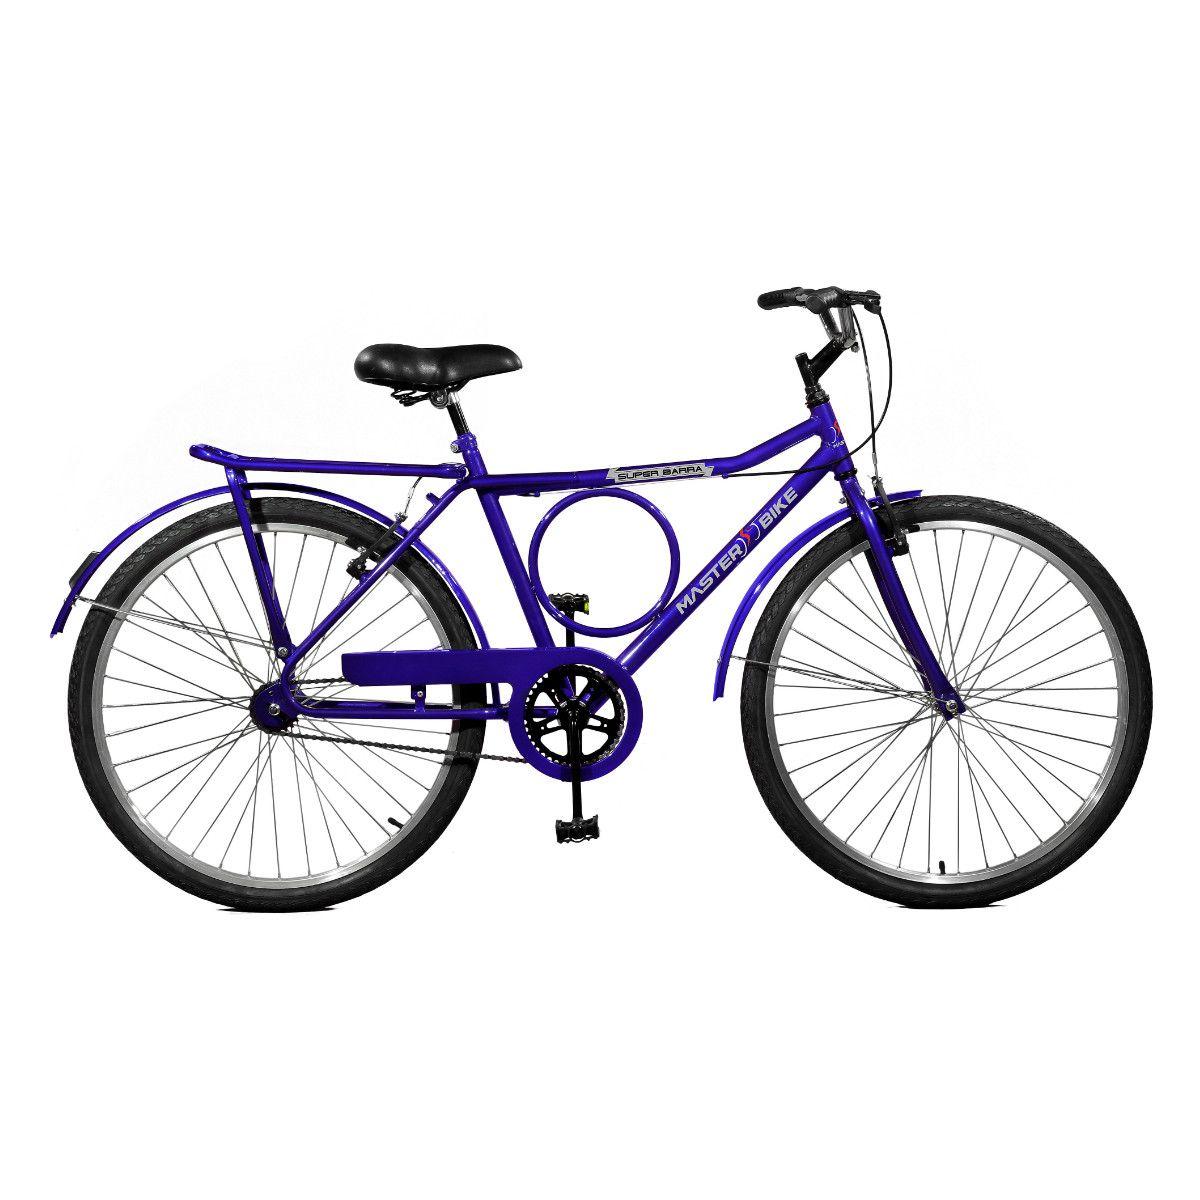 Bicicleta Master Bike Aro 26 Super Barra Freio V-Brake Azul